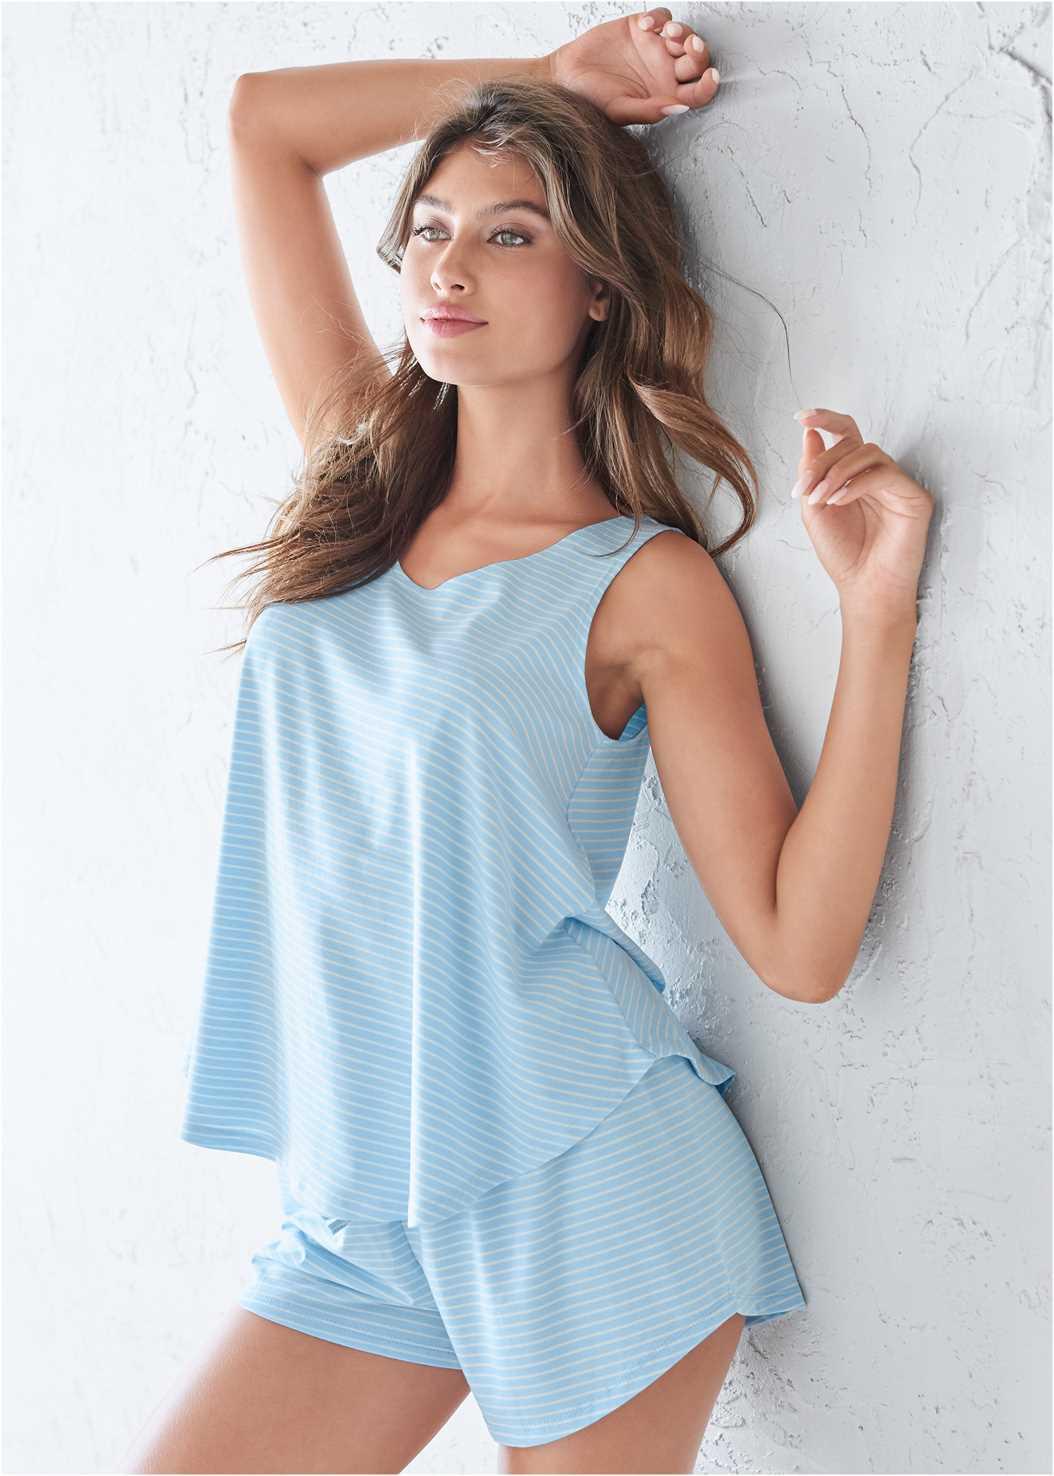 Sleep Shorts,Sleeveless Sleep Robe